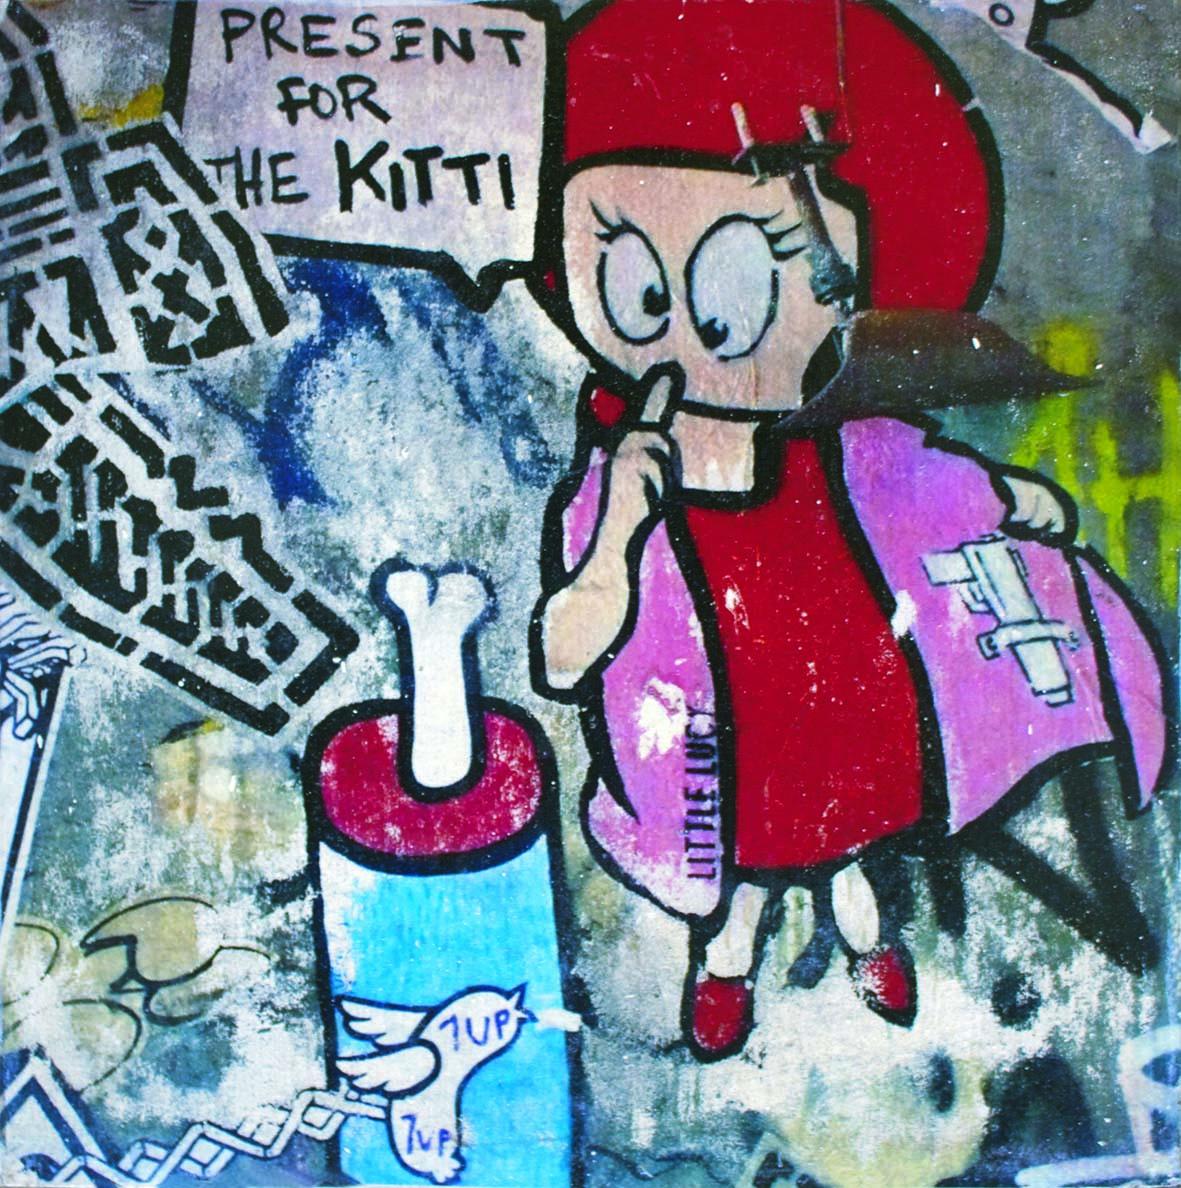 PRESENT FOR THE KITTI 2017 / Fototransferdruck auf MDF-Block / 20x20 cm